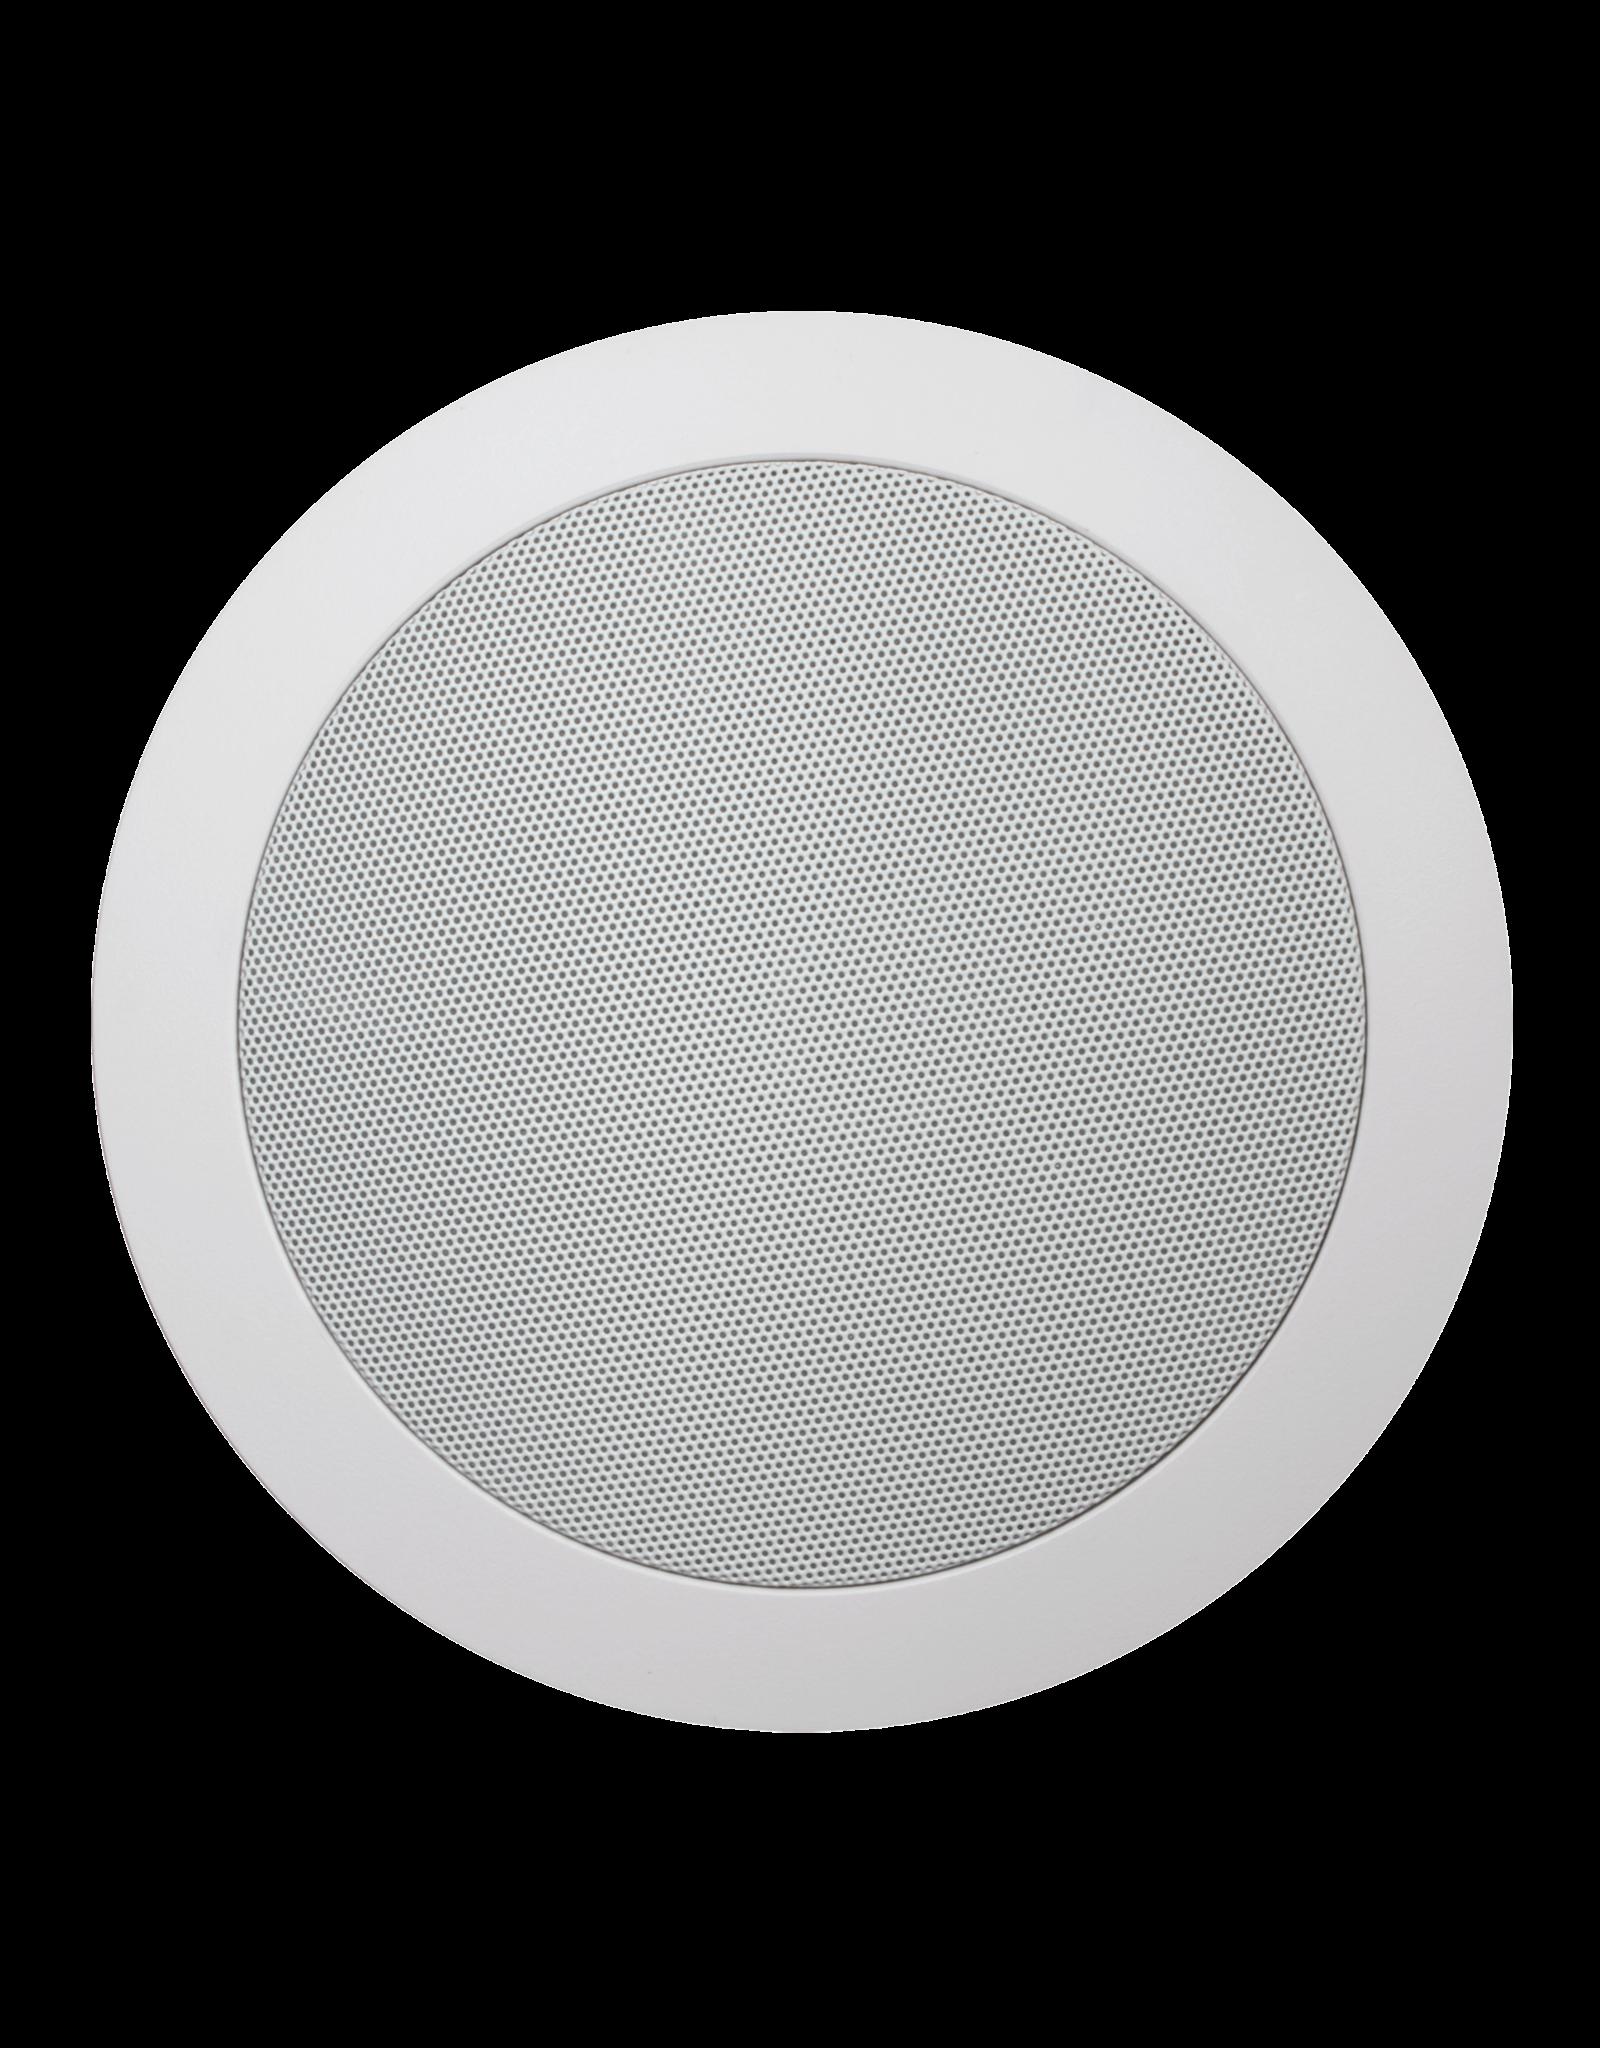 "Audac Quick-fit™ dual cone 5 1/4"" ceiling speaker 8 Ohm/100V 16 Ohm version"